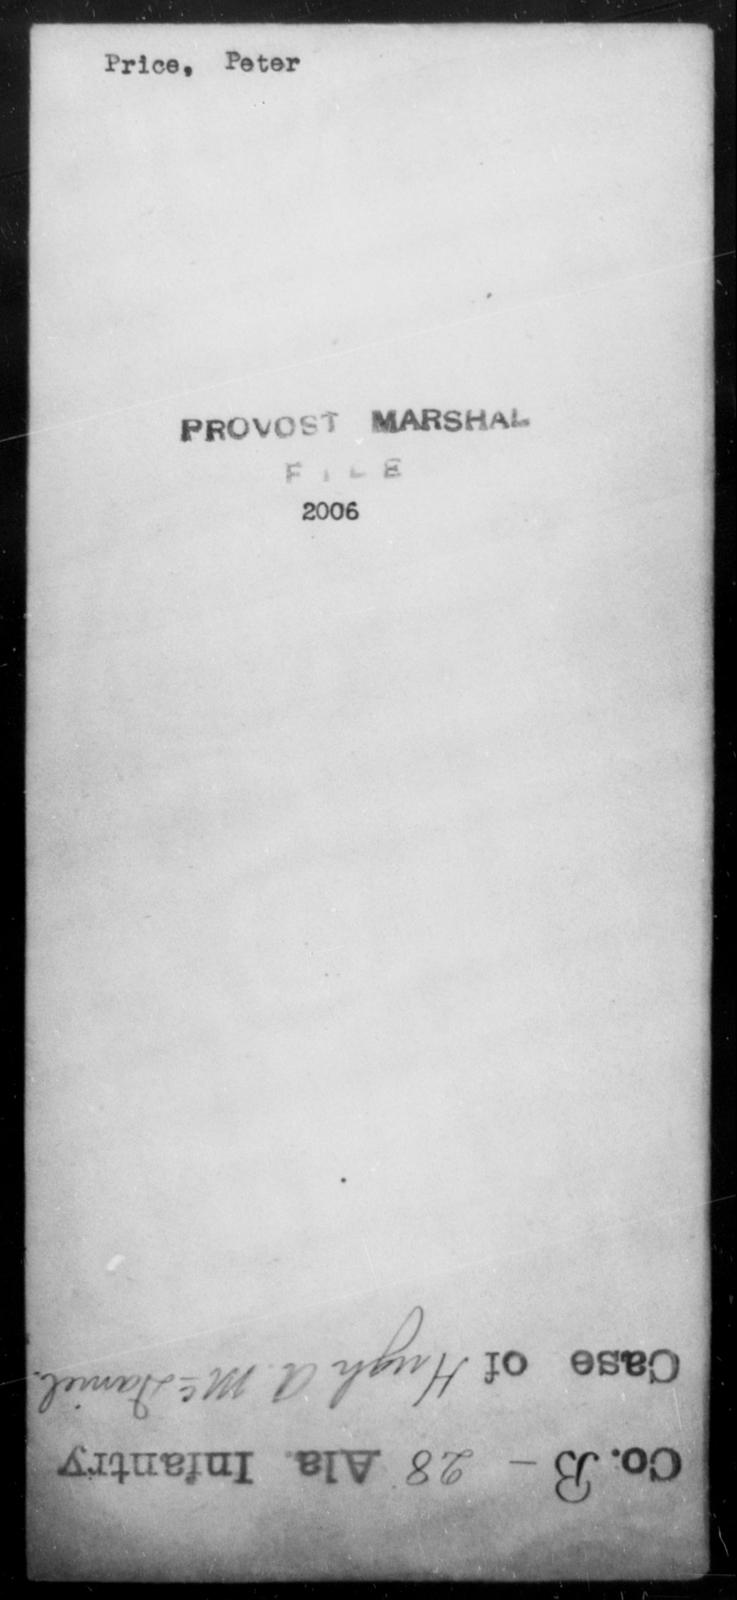 Price, Peter - State: [Blank] - Year: [Blank]